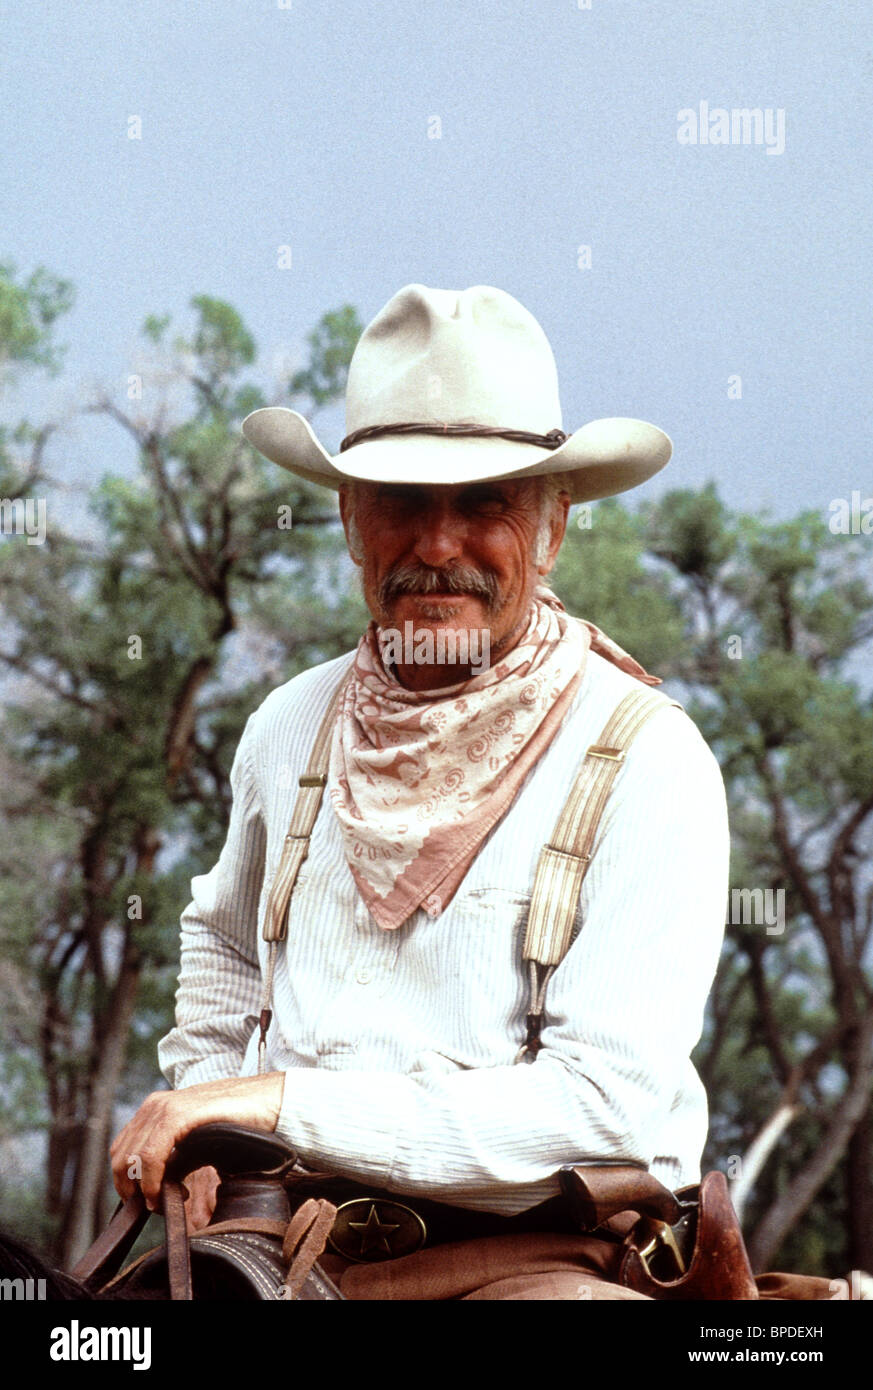 cea1c45e ROBERT DUVALL LONESOME DOVE (1989 Stock Photo: 31029897 - Alamy